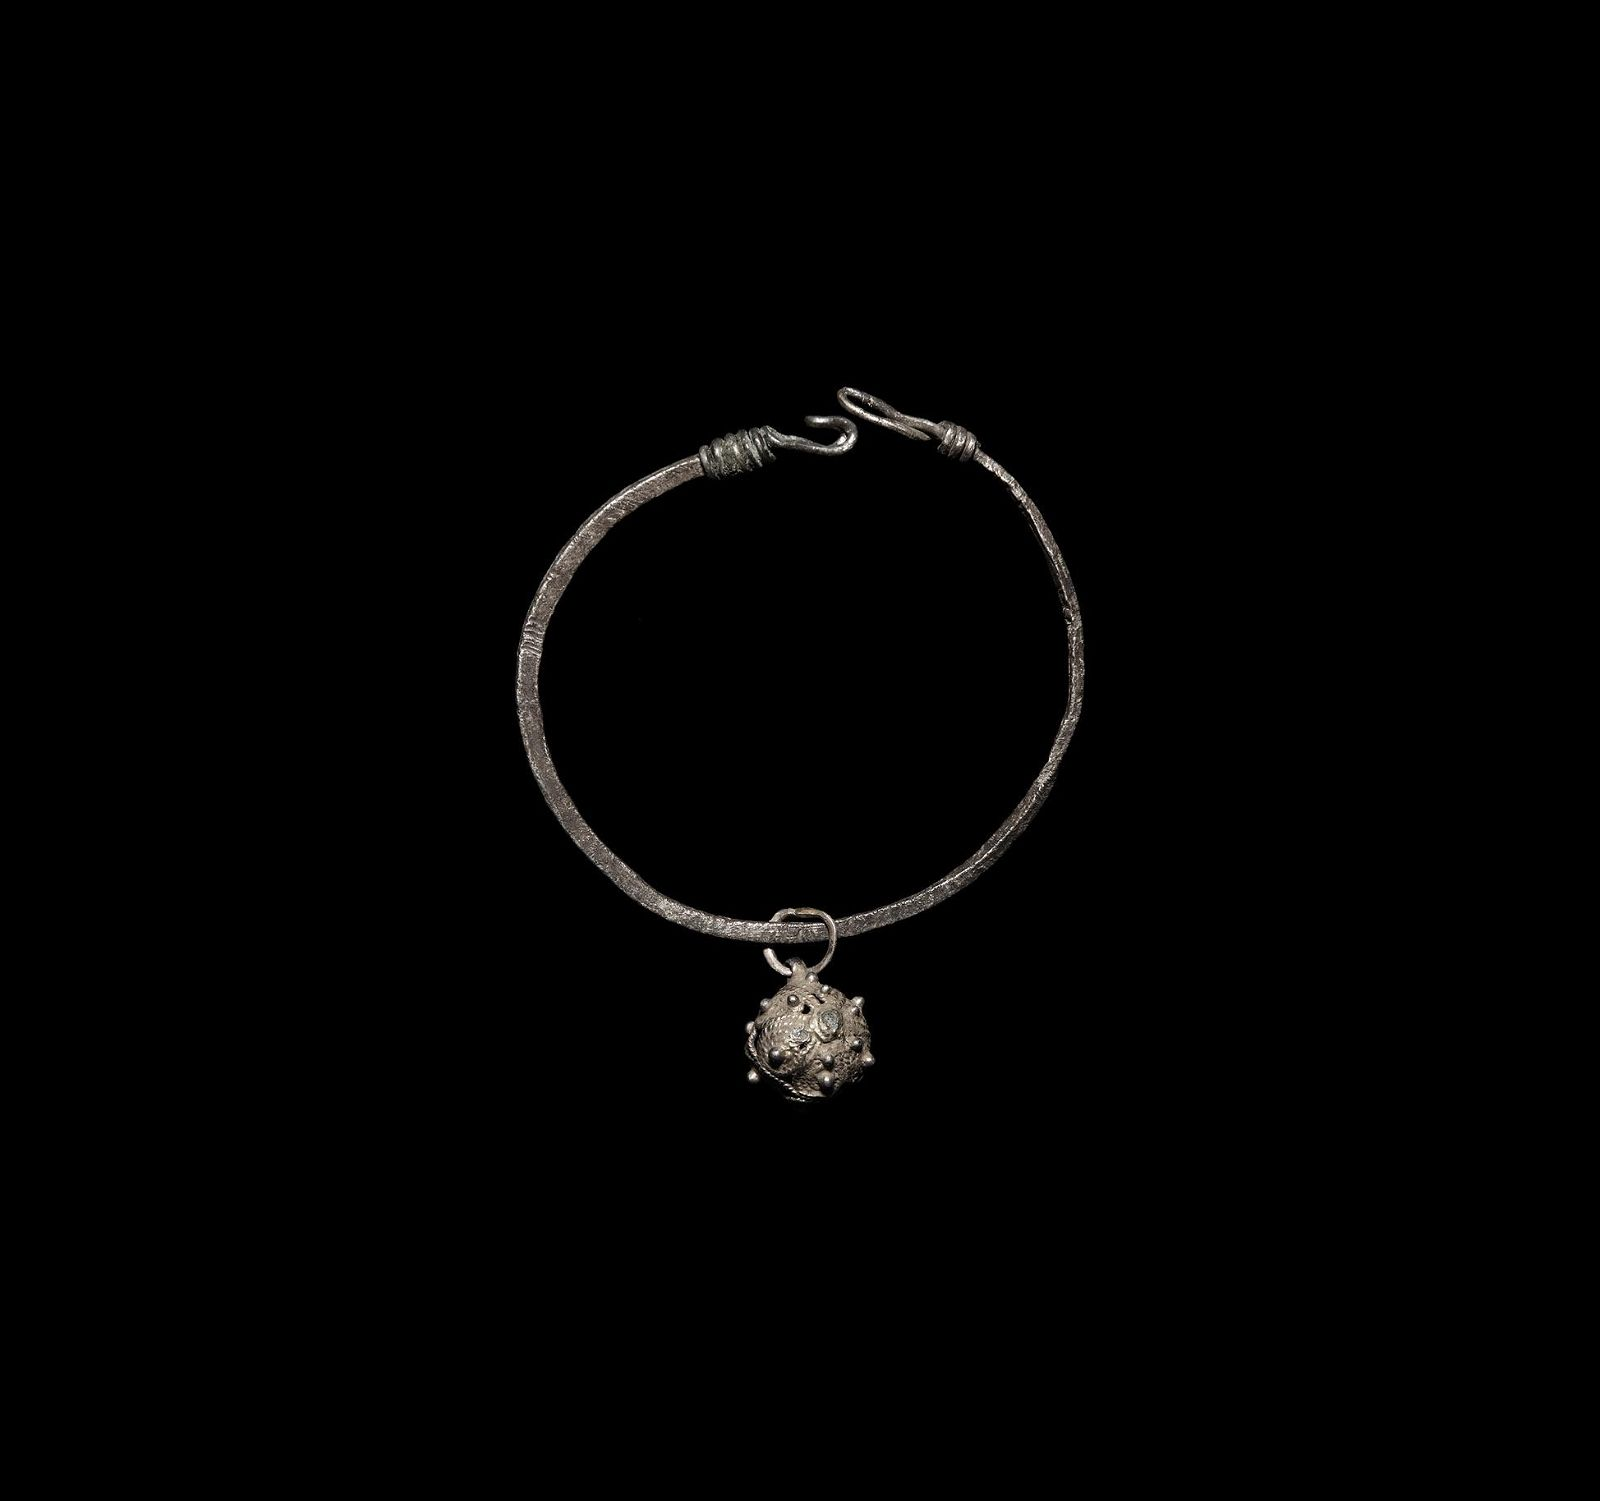 Islamic Silver Bracelet with Pendant